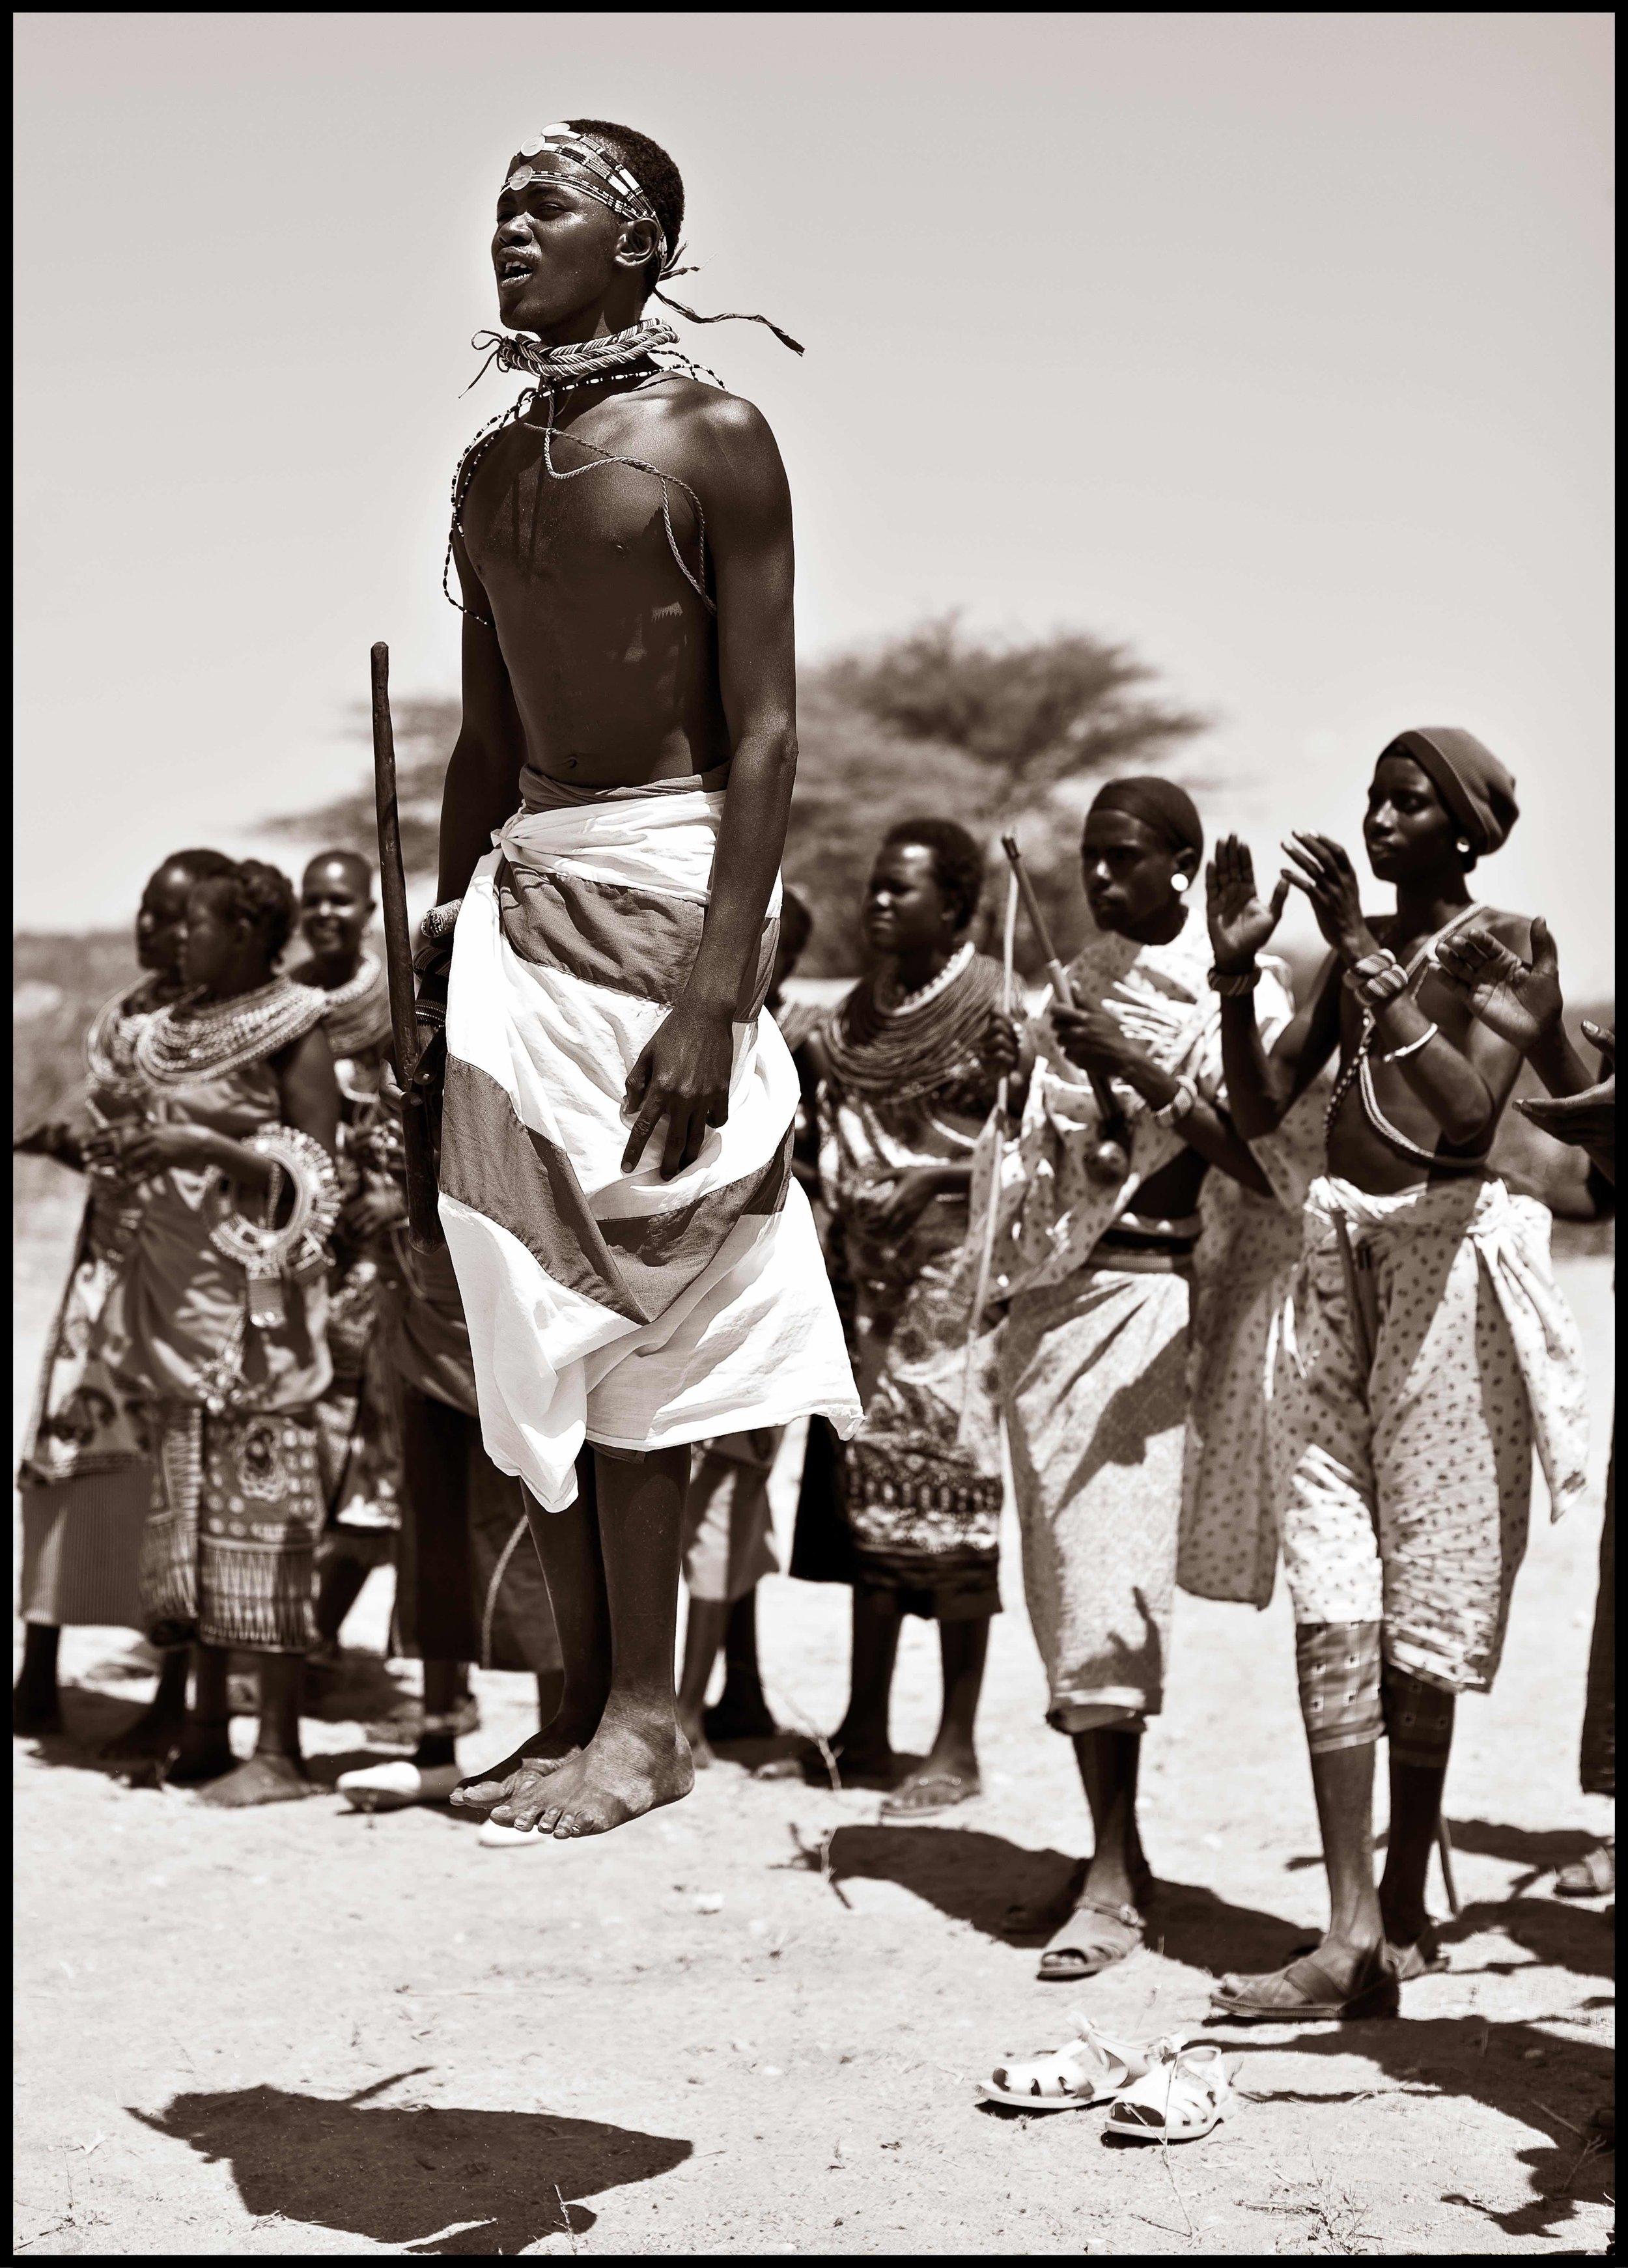 Samburu Tribal Leader_web ready.jpg